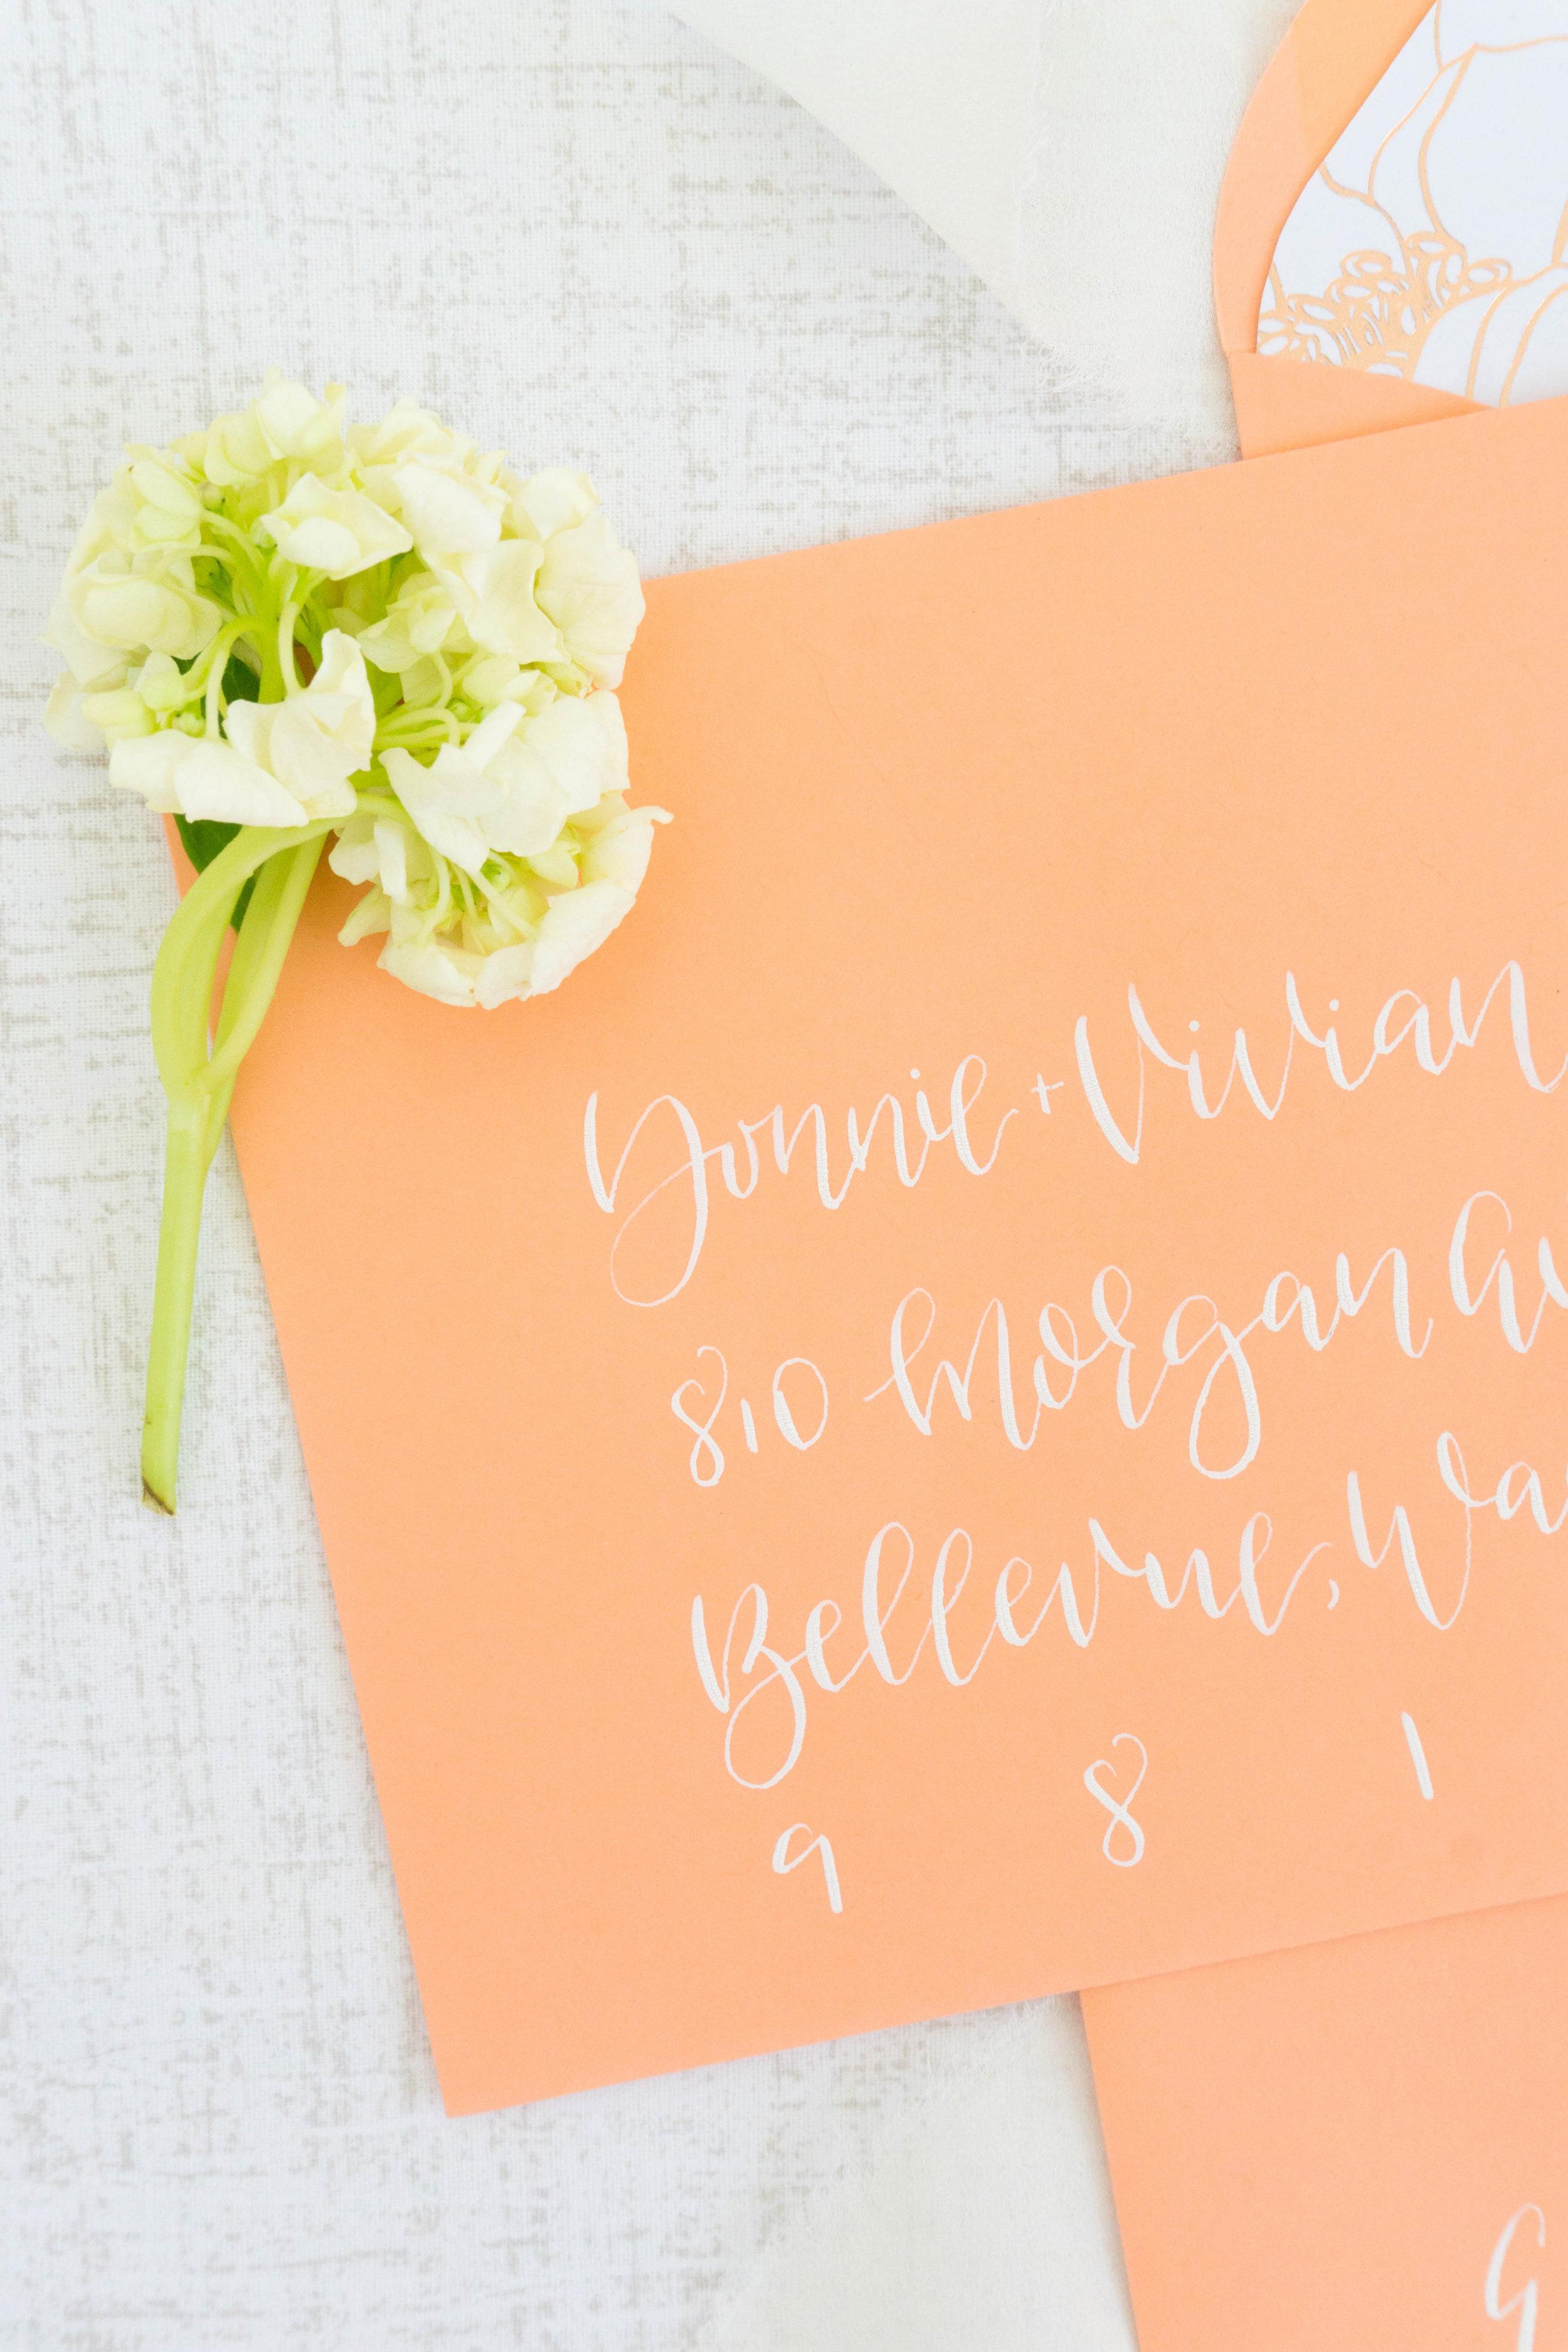 love-fern-design-studio-custom-wedding-invitations-for-the-modern-couple-modern-calligraphy-in-seattle-washington-custom-wedding-stationery-coral-white-floral-envelope-liner